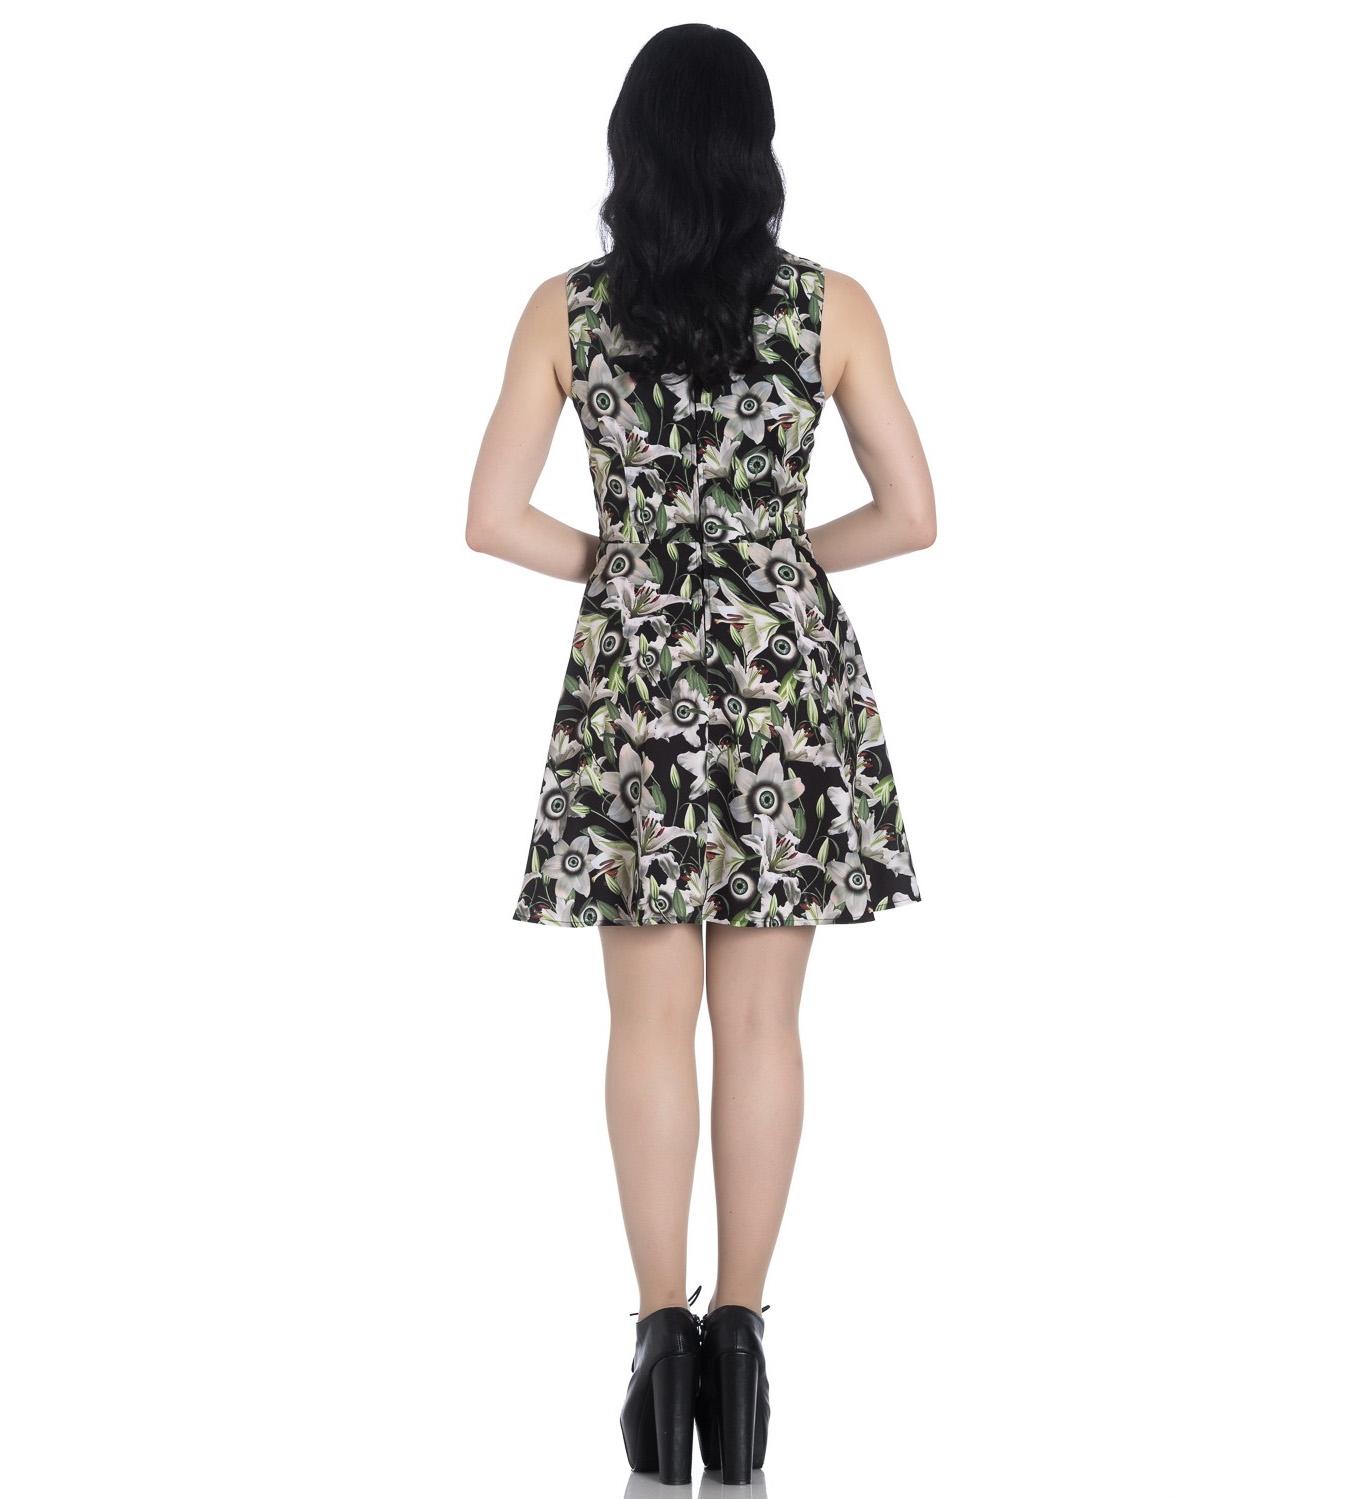 Hell-Bunny-Black-Lace-Up-Goth-Punk-Mini-Dress-PEEPERS-Eyeballs-Flowers-All-Sizes thumbnail 19